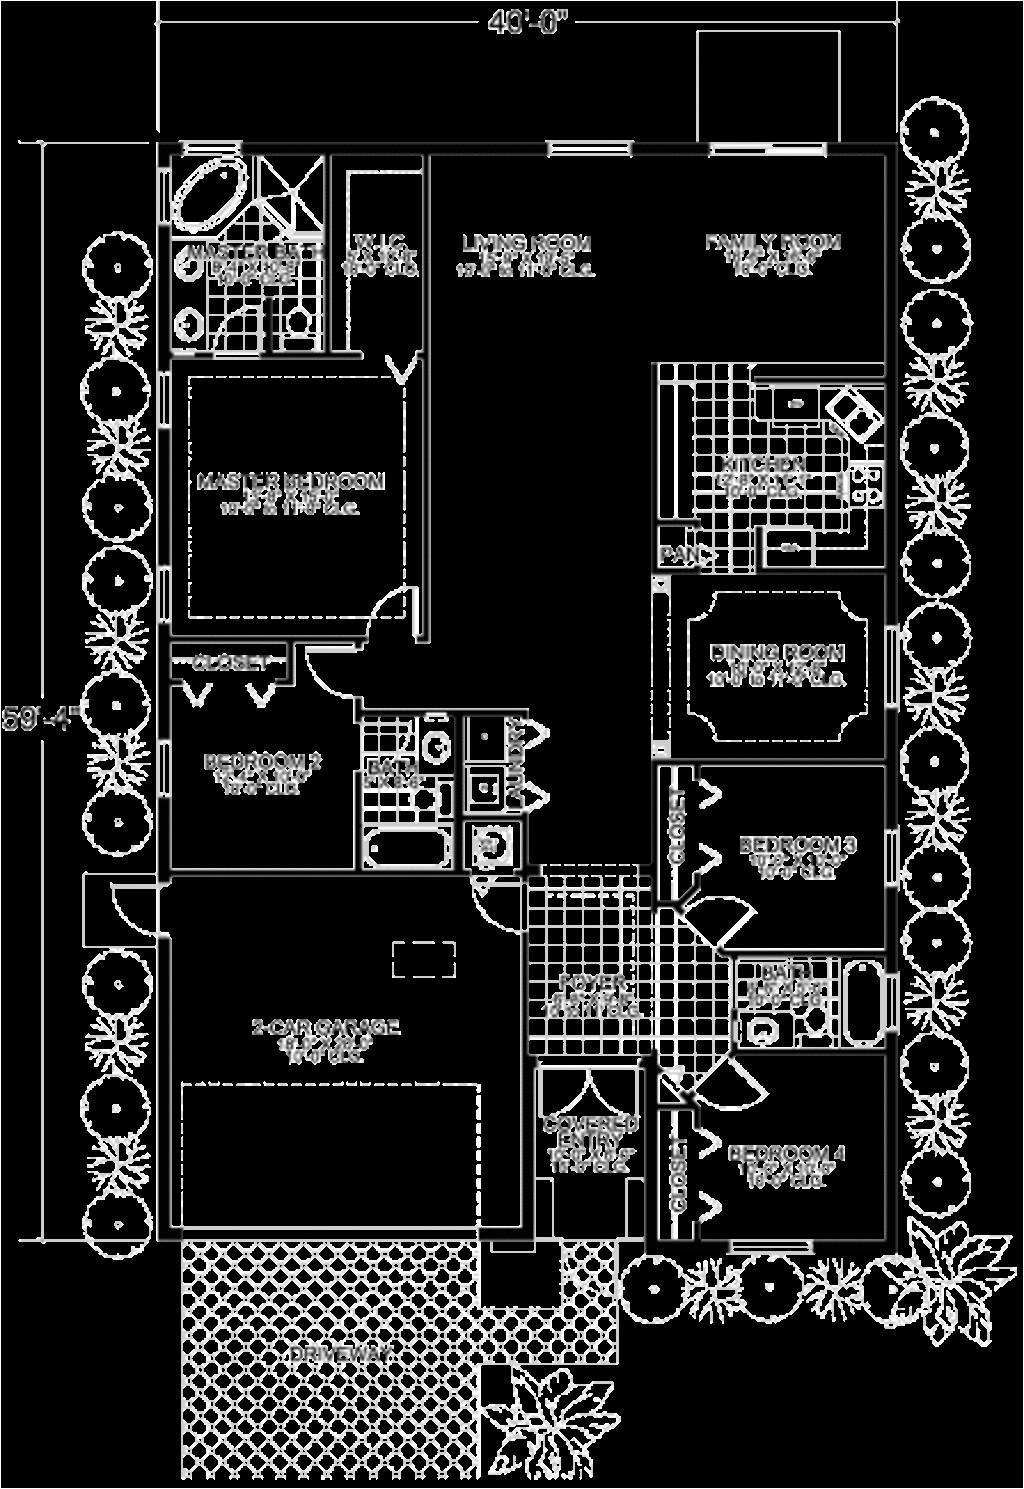 30x60 4 bedroom house plan